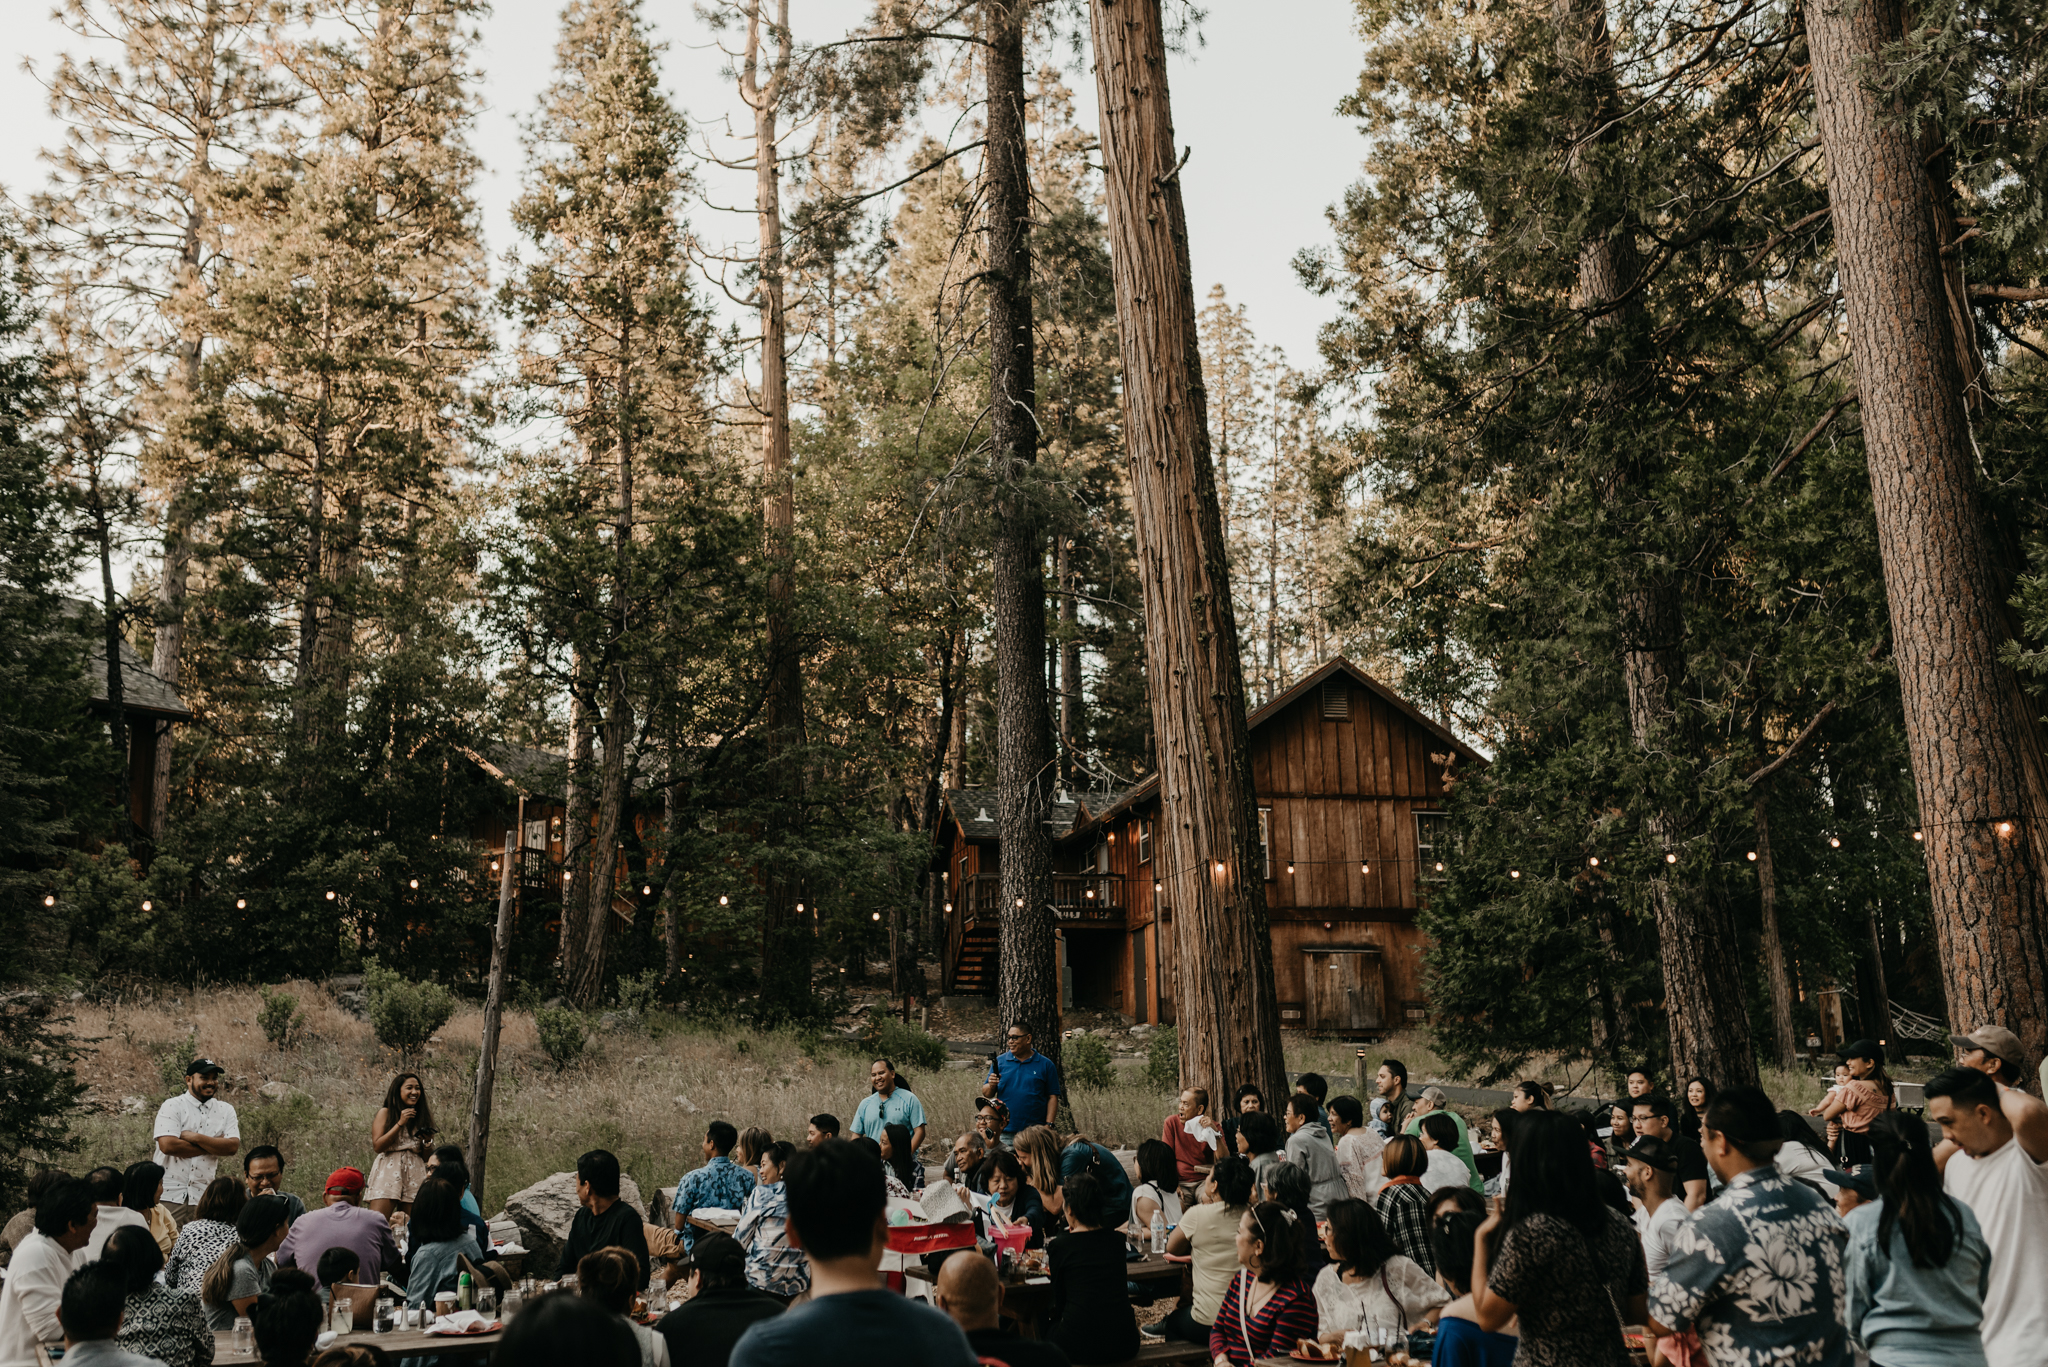 © Isaiah + Taylor Photography - Evergreen Lodge Destination Yoesmite Wedding - Los Angeles Wedding Photographer-007.jpg